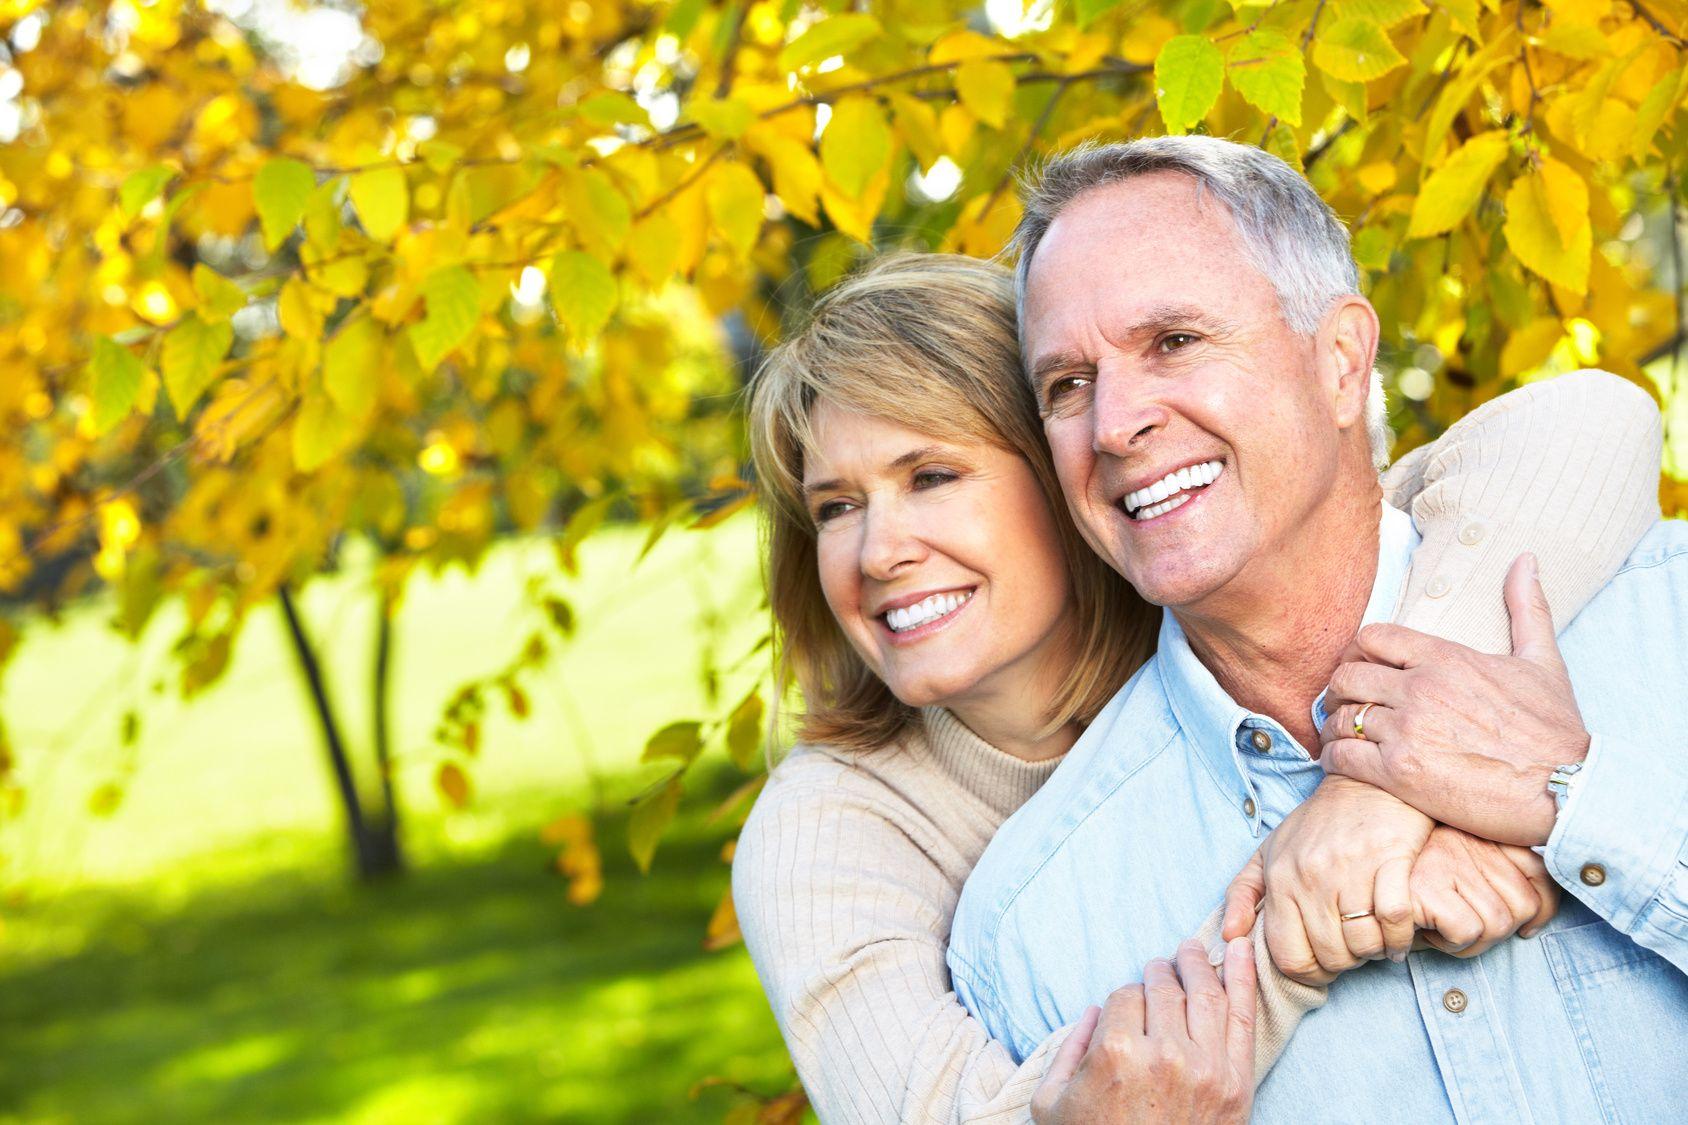 100 vapaa dating yli 60s